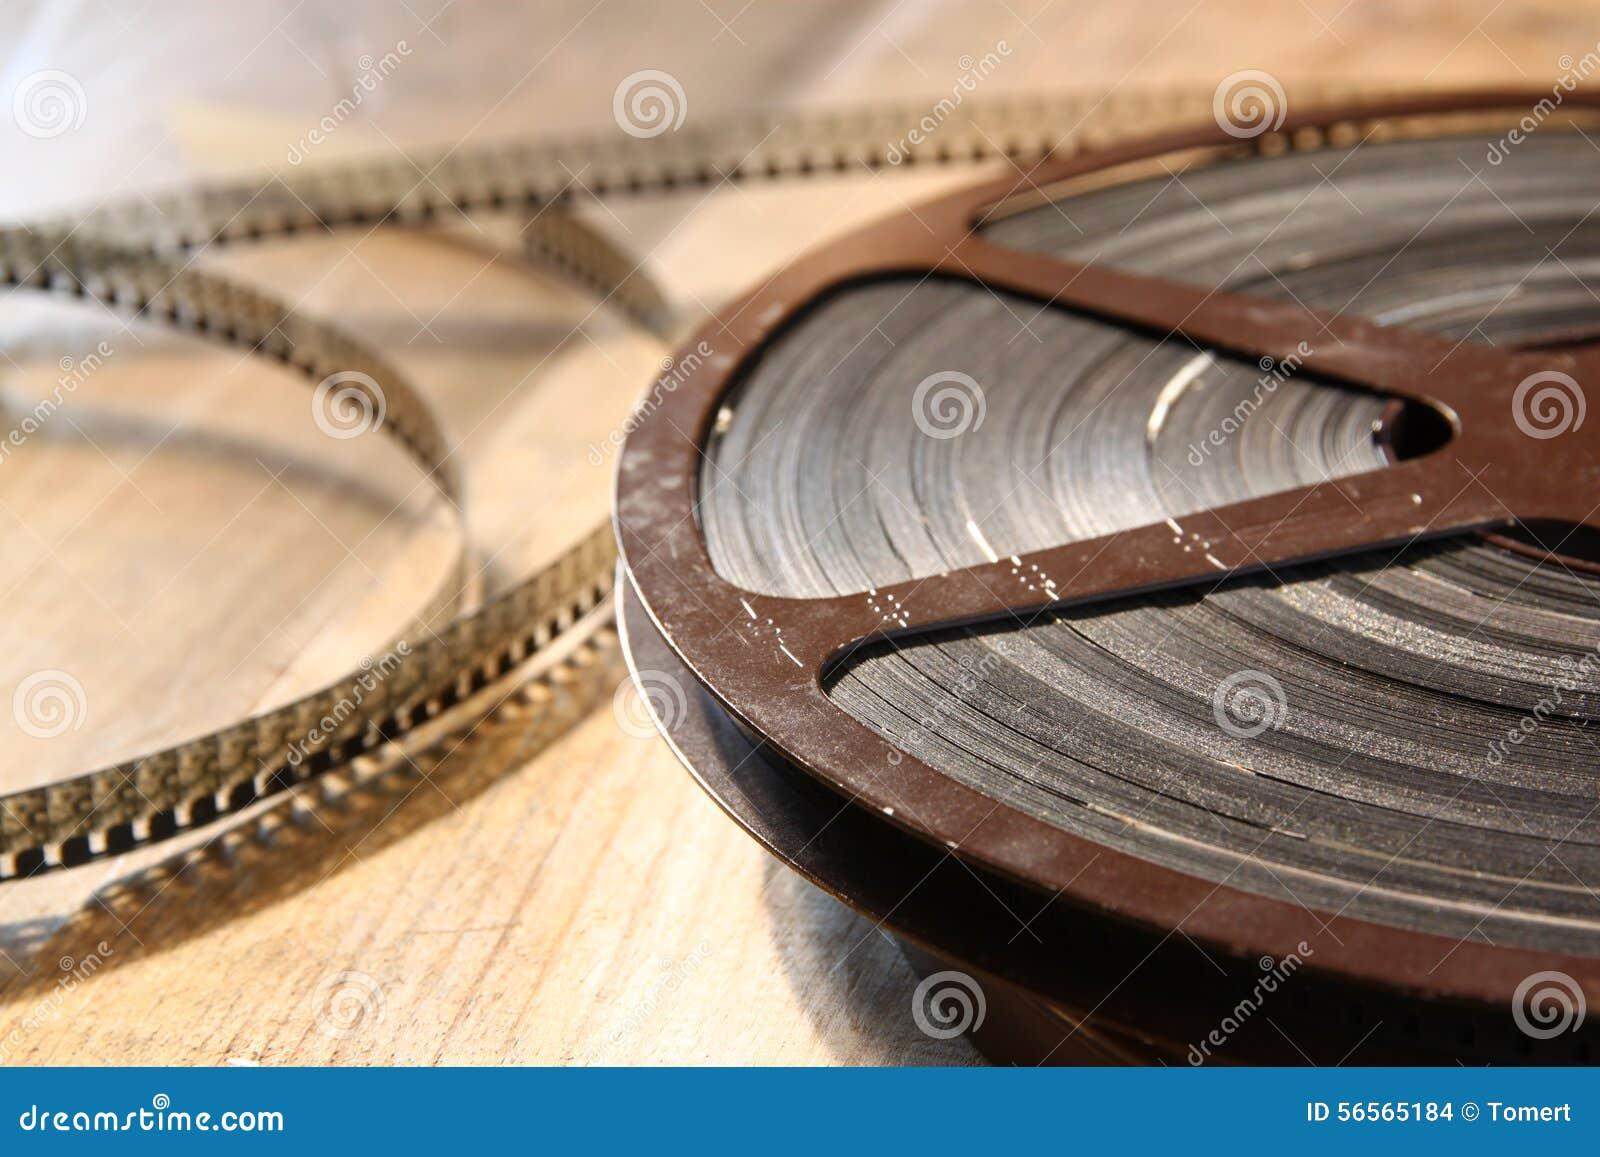 Download Τοπ εικόνα άποψης του παλαιού εξελίκτρου κινηματογράφων 8 χιλ. πέρα από το ξύλινο υπόβαθρο Στοκ Εικόνες - εικόνα από ψυχαγωγία, σπίτι: 56565184